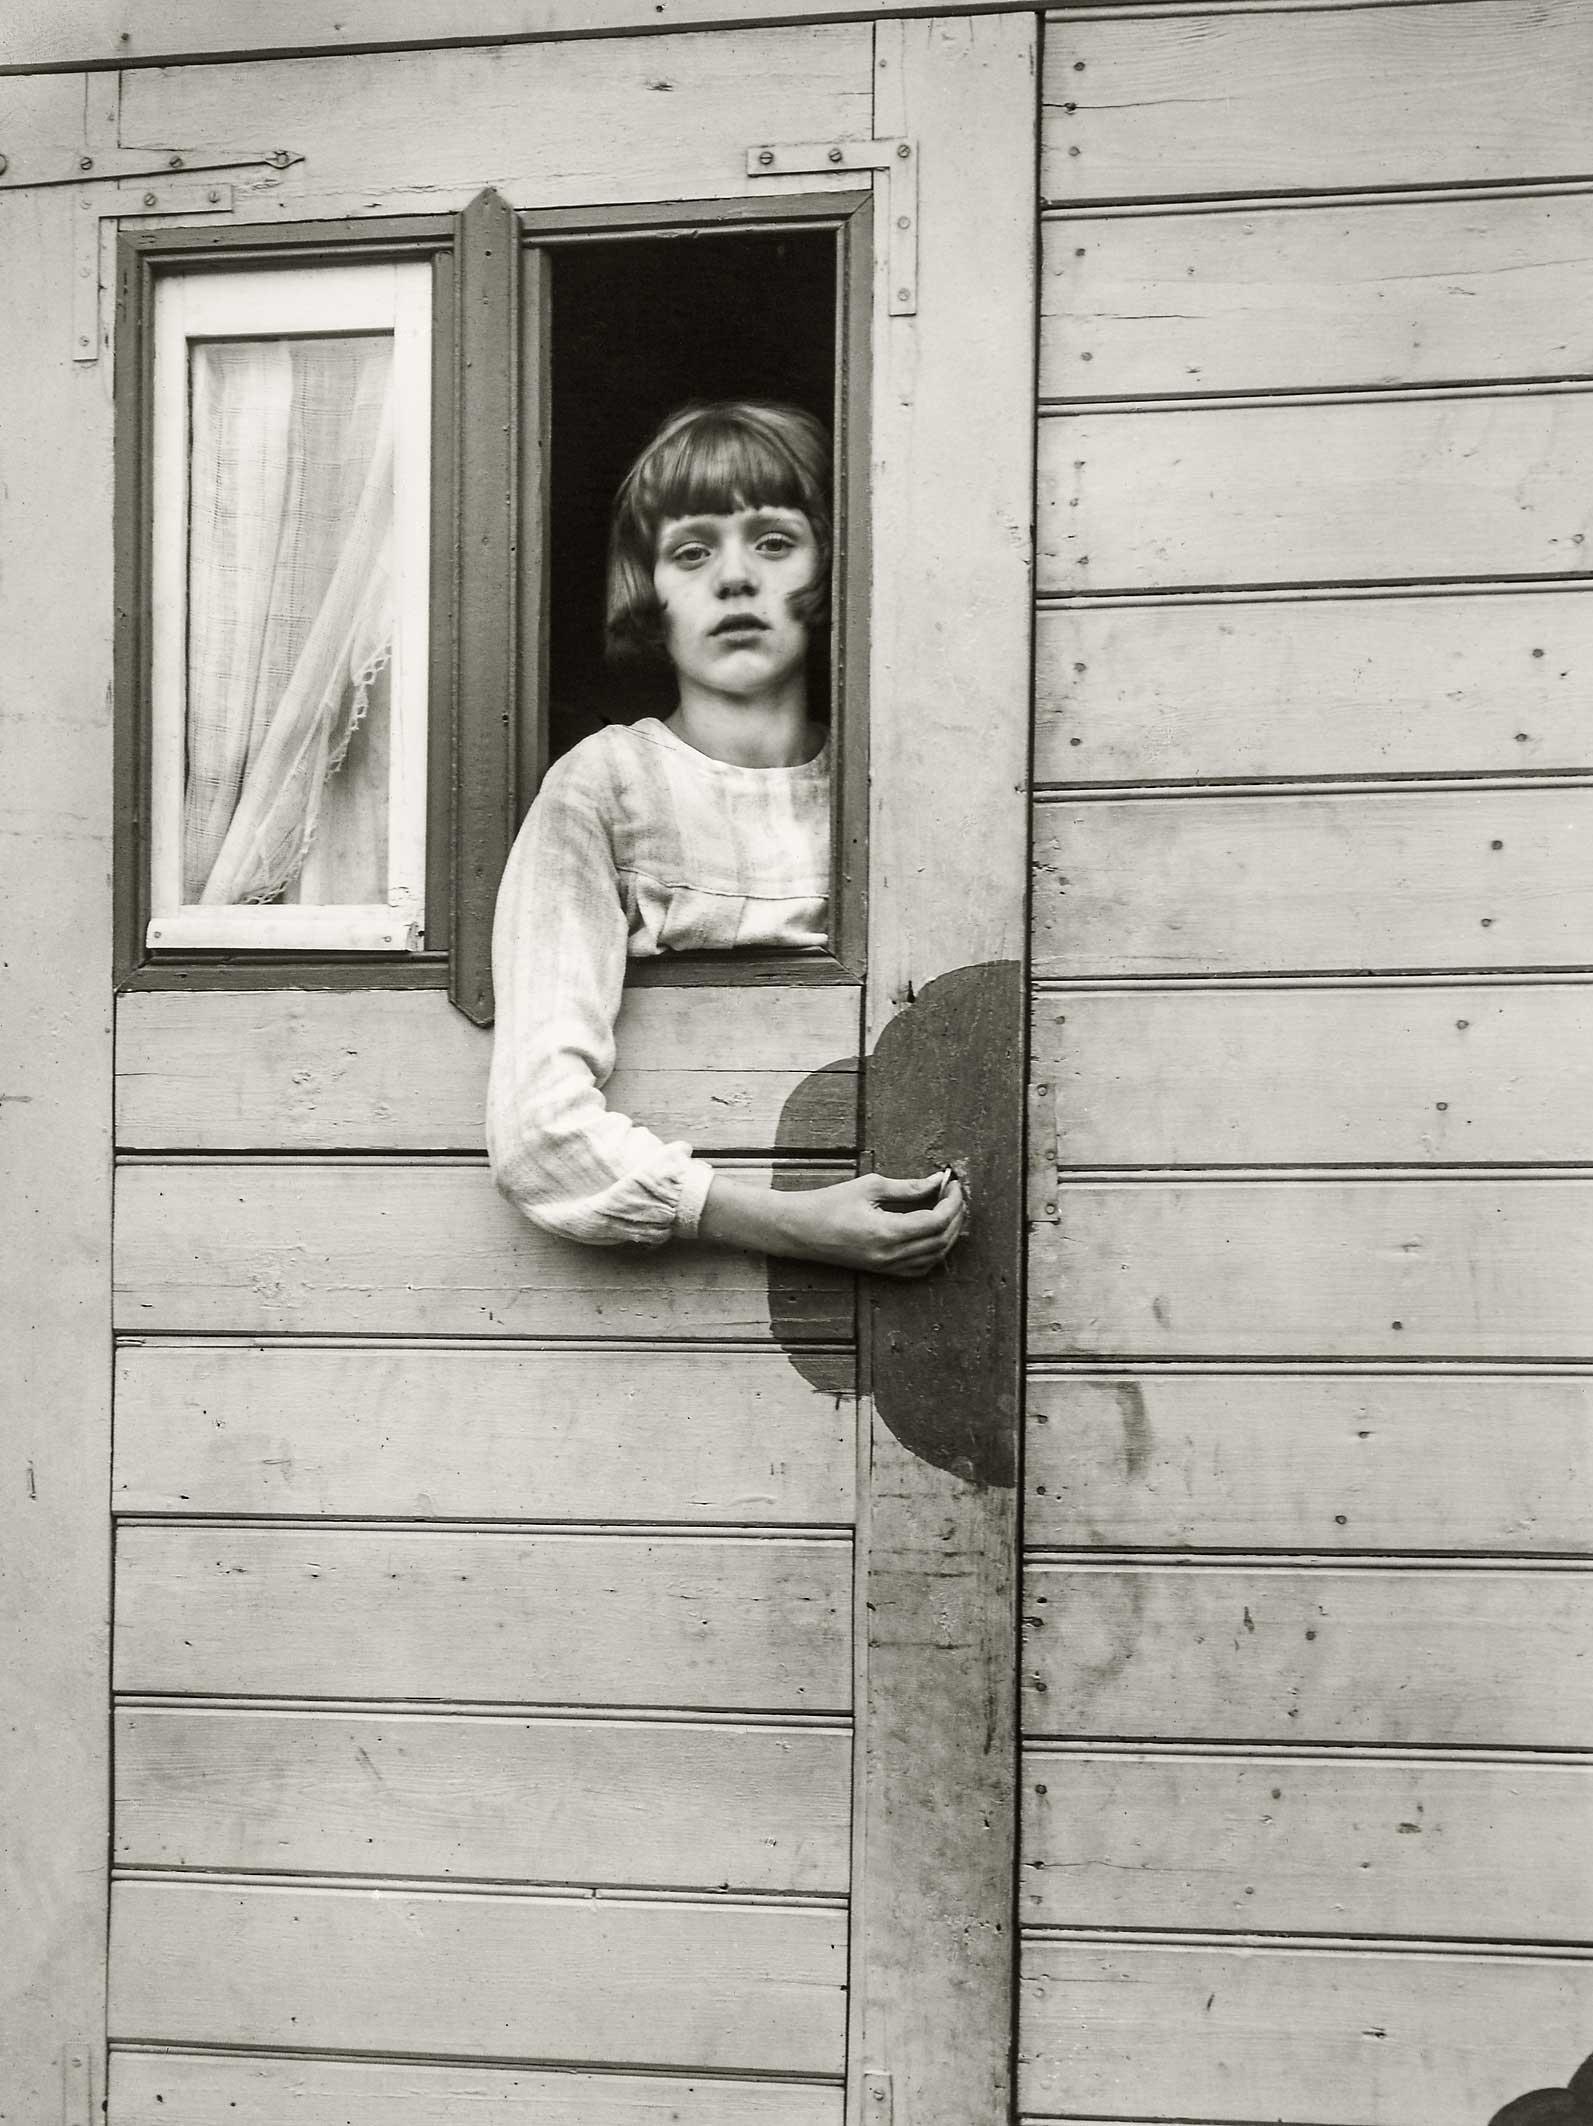 Fragmen de 'Noia en una caravana de fira',1926–1932 August Sander Archiv, Cologne              | August Sander